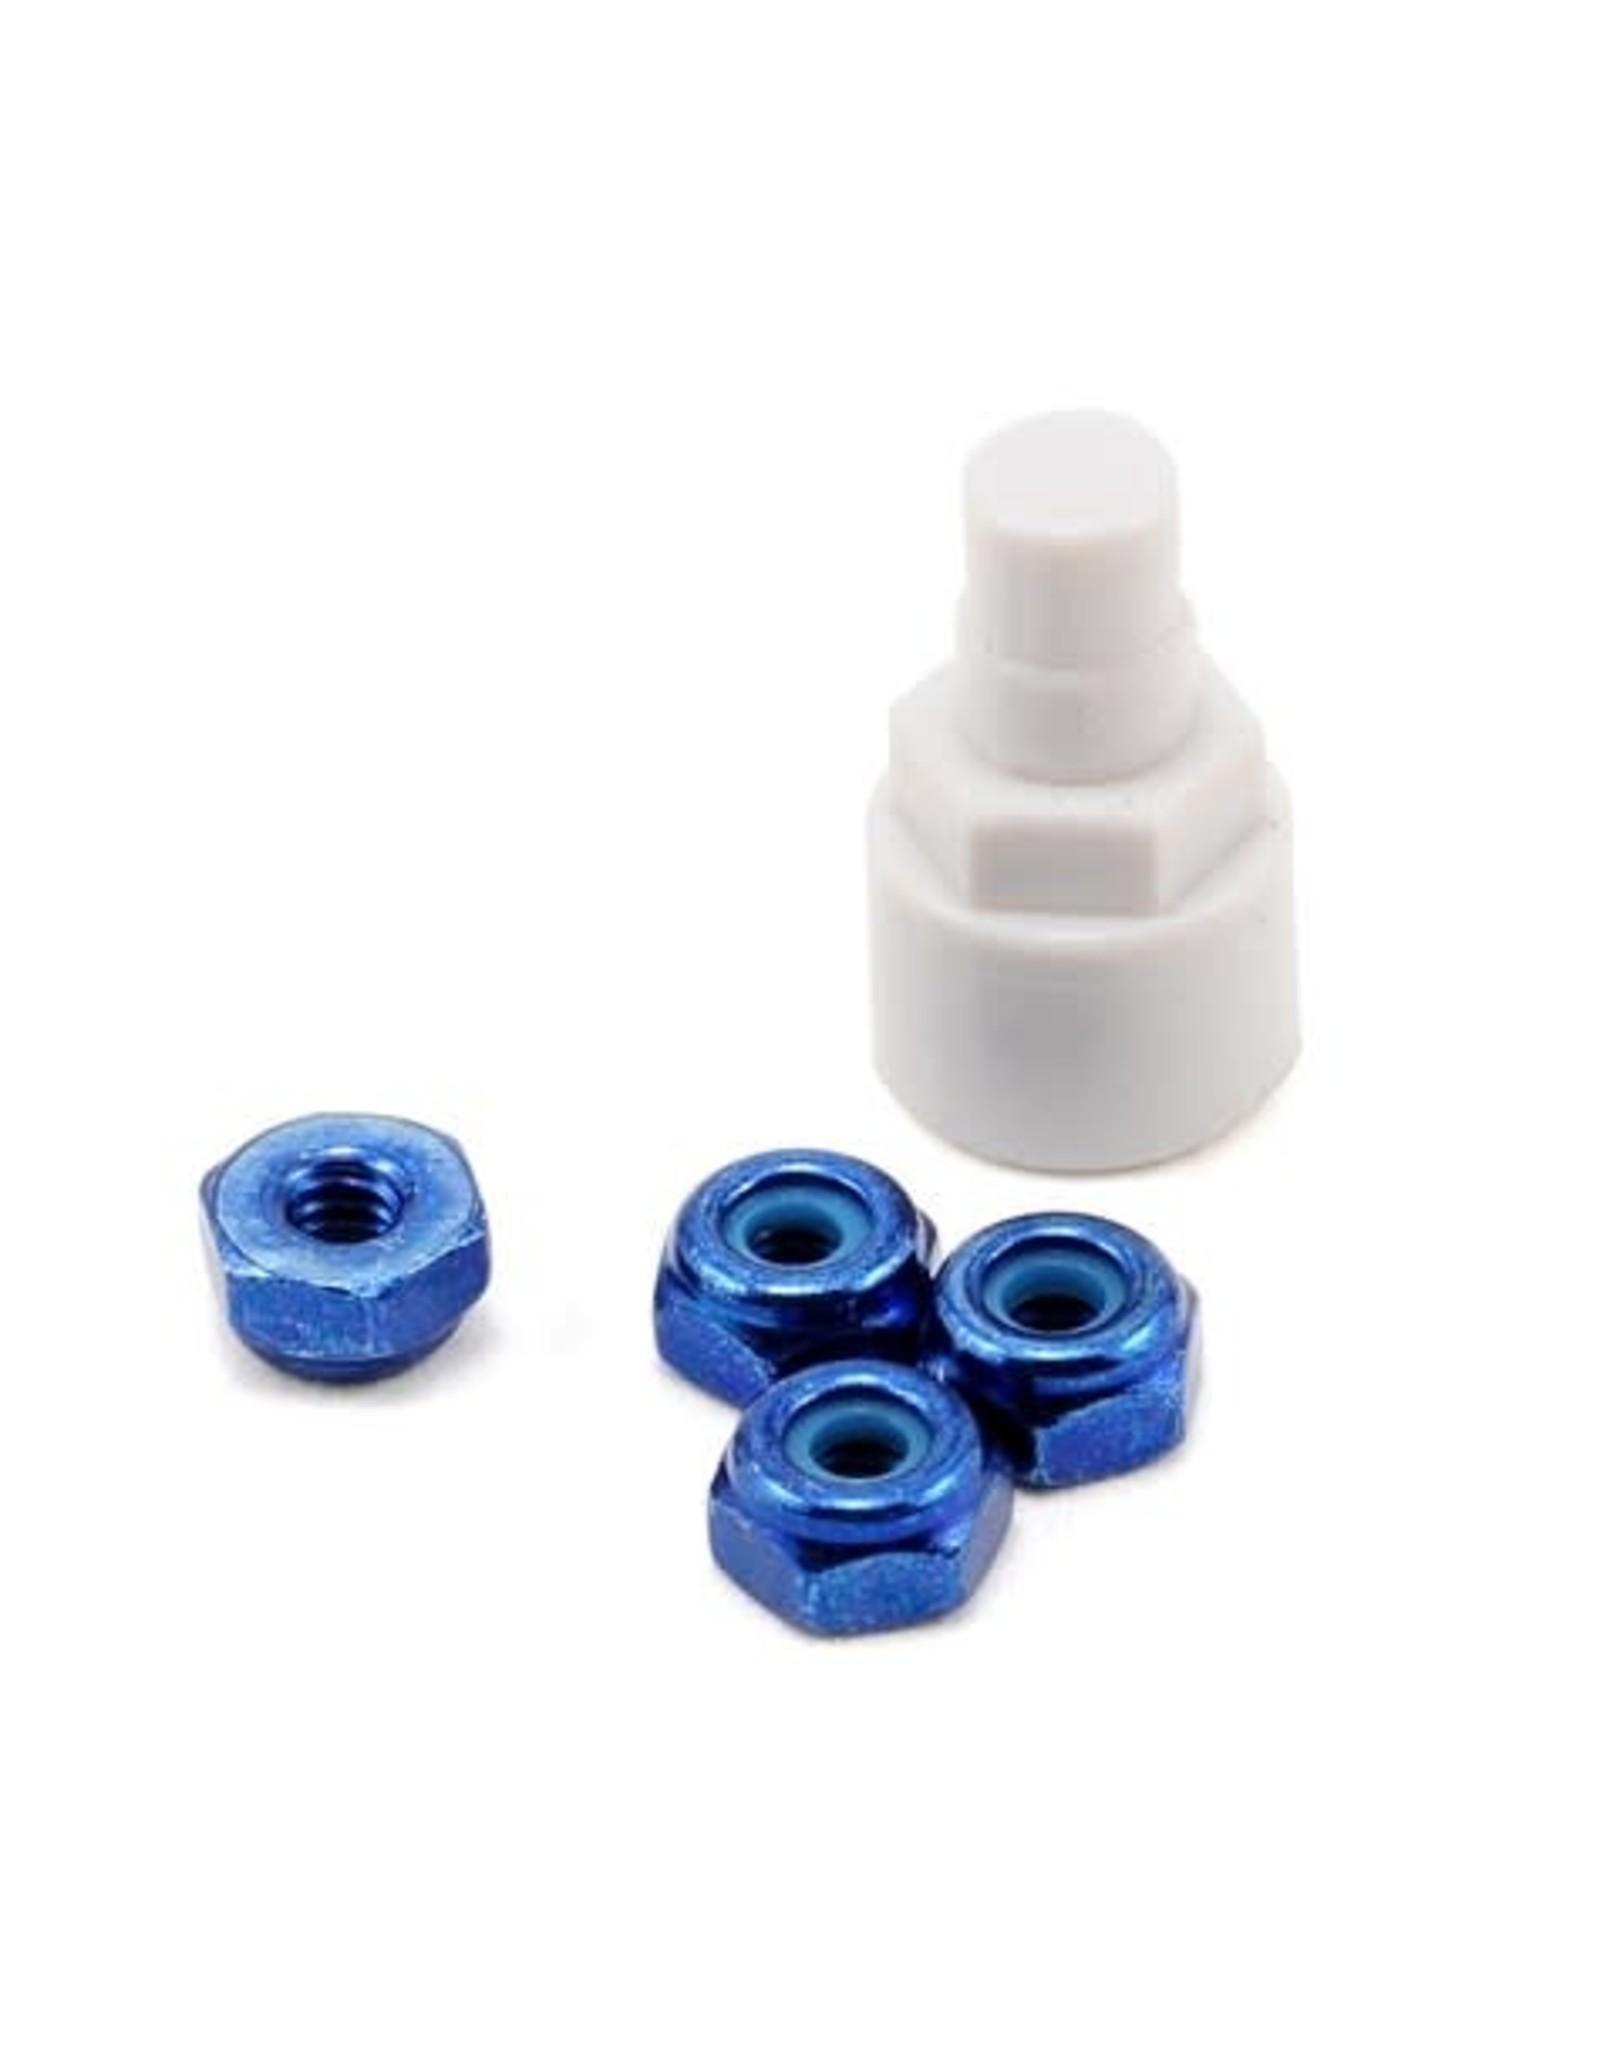 Kyosho Mini Z Color Nylon Nut Blue